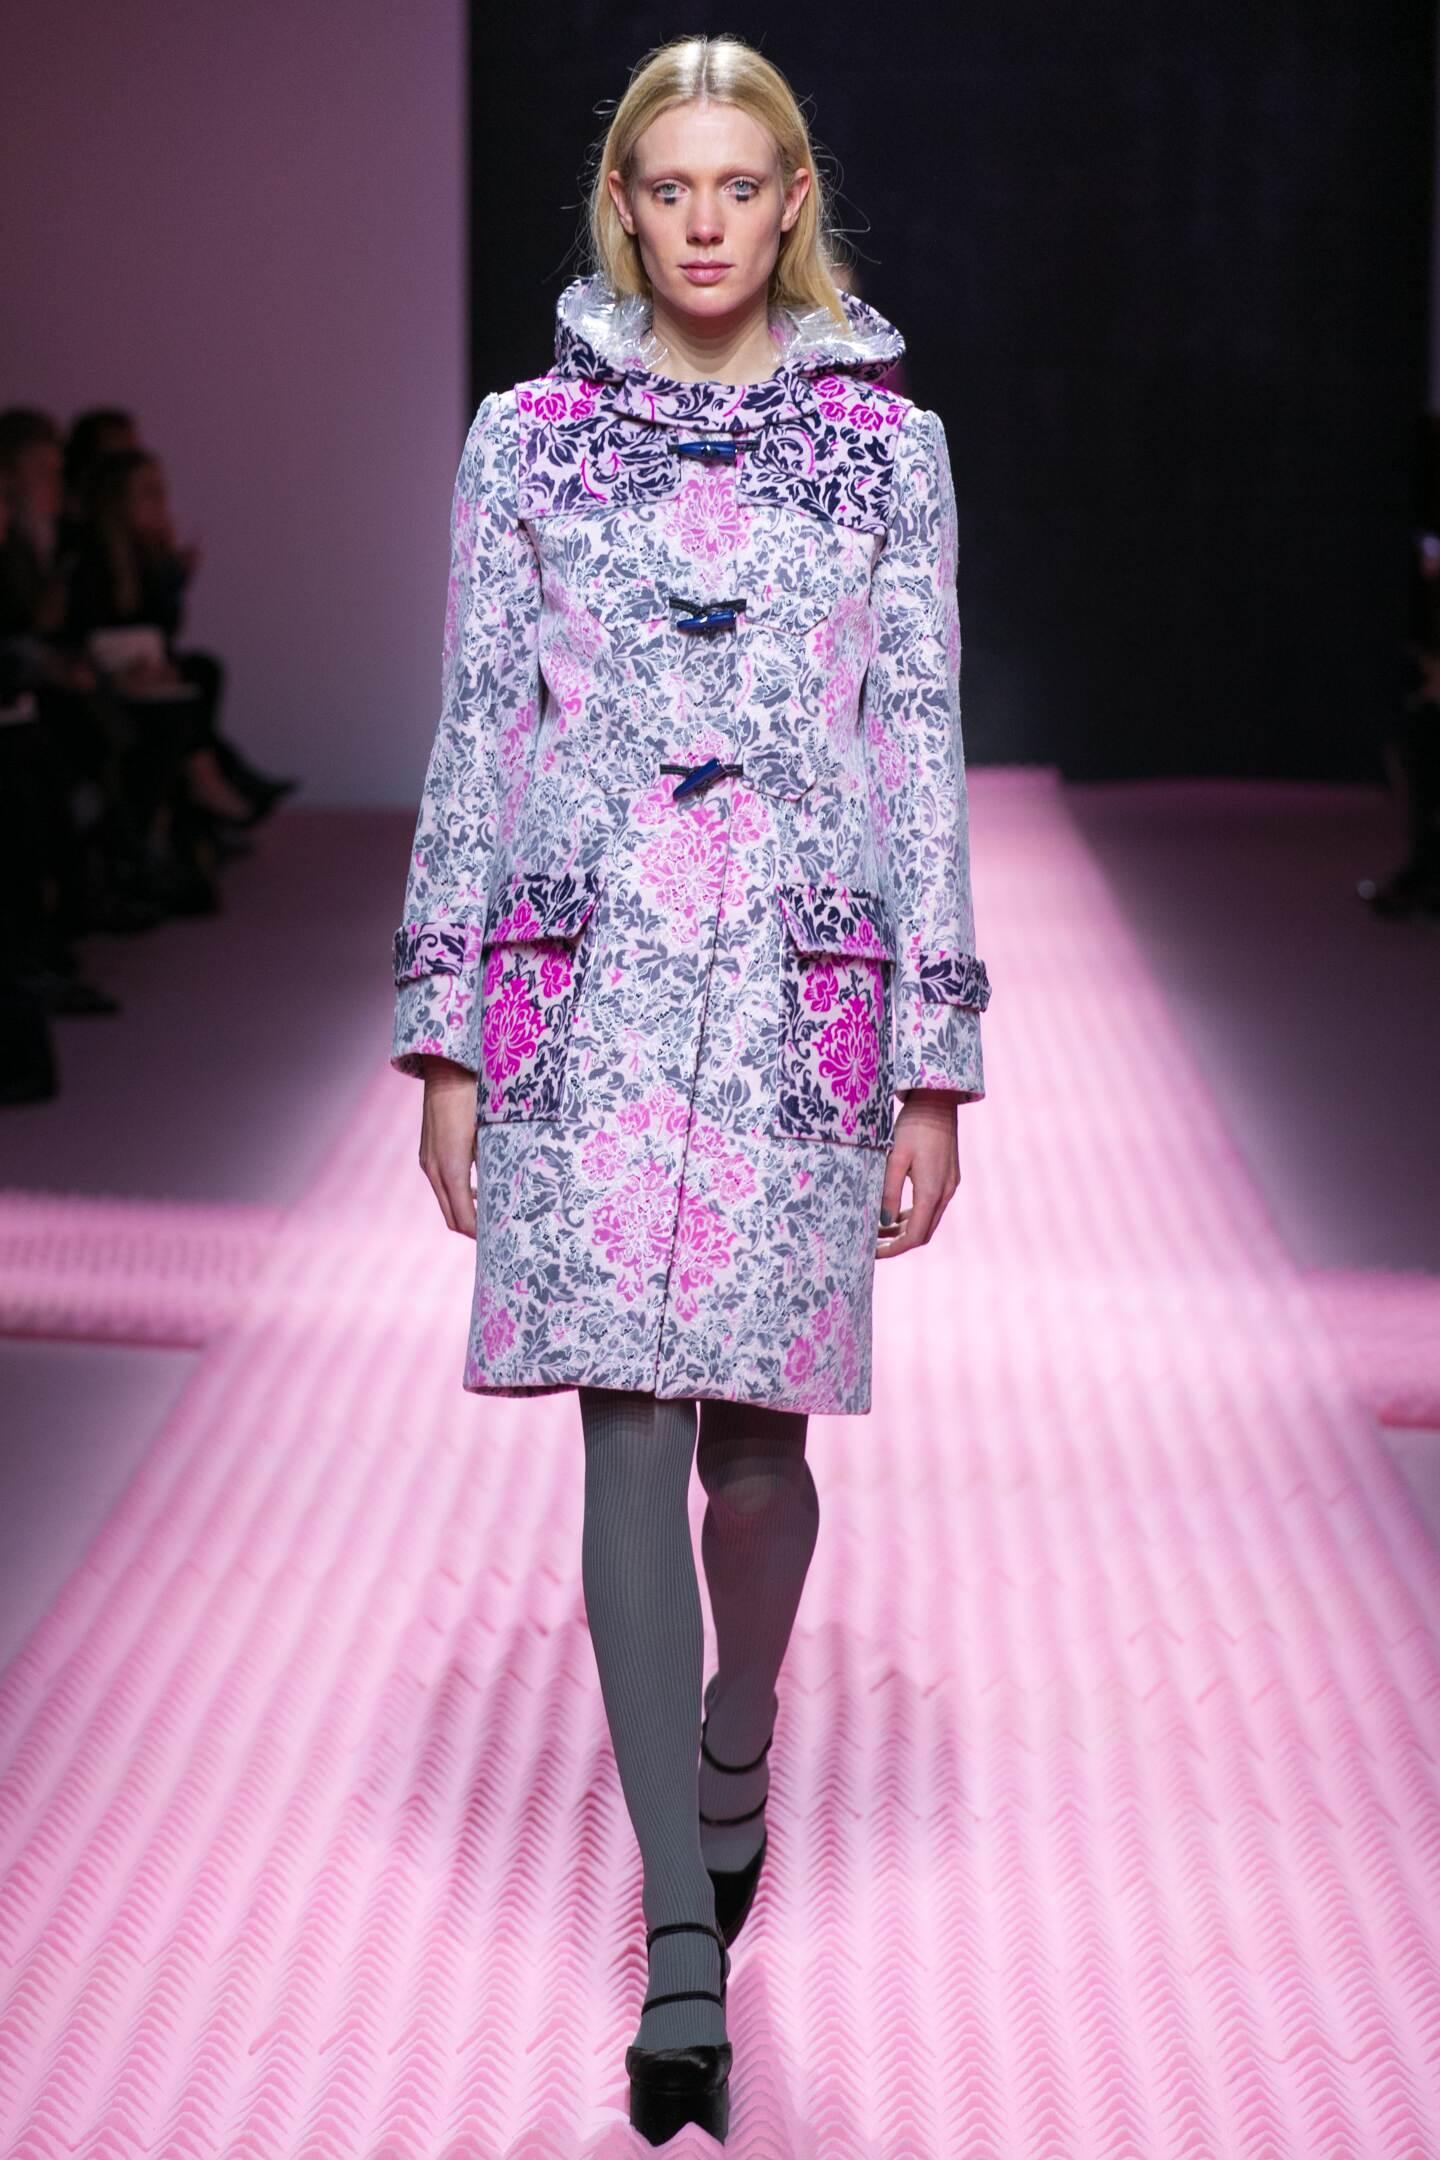 Winter 2015 Woman Trends Mary Katrantzou Collection